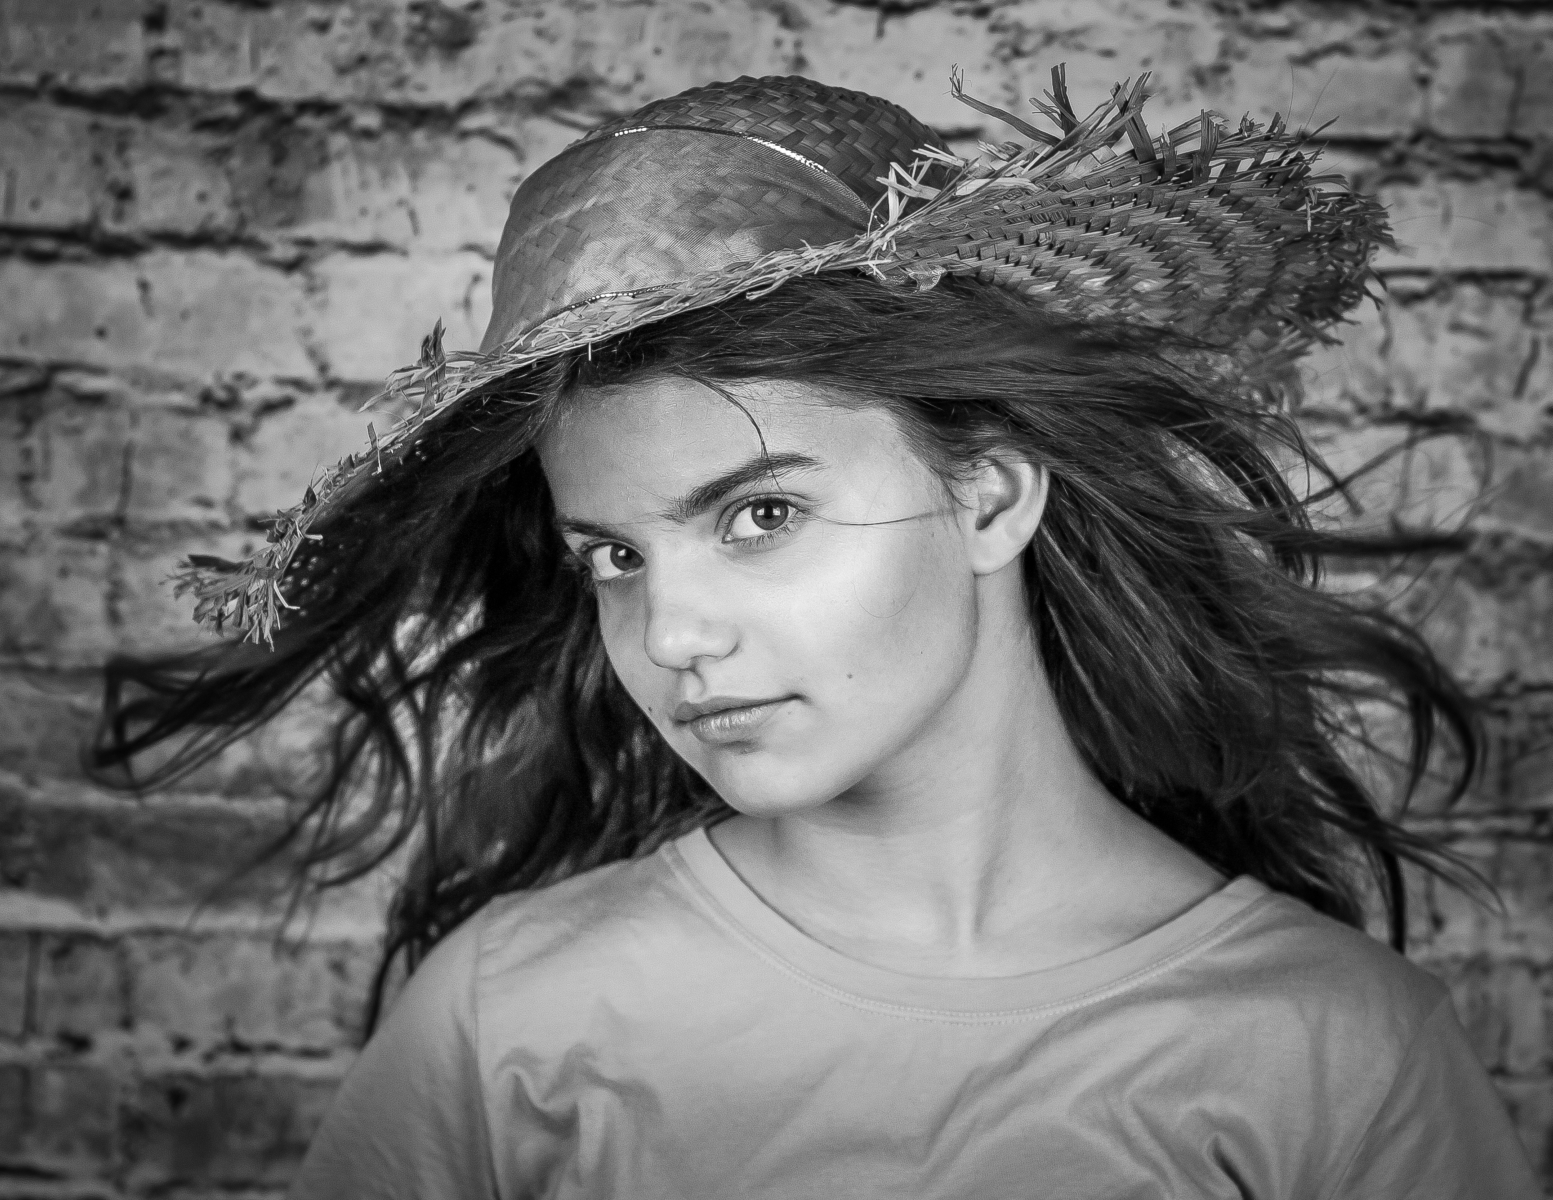 'Bella Bellisima' (MI 1 Place) by Anna Wojdyla - PE